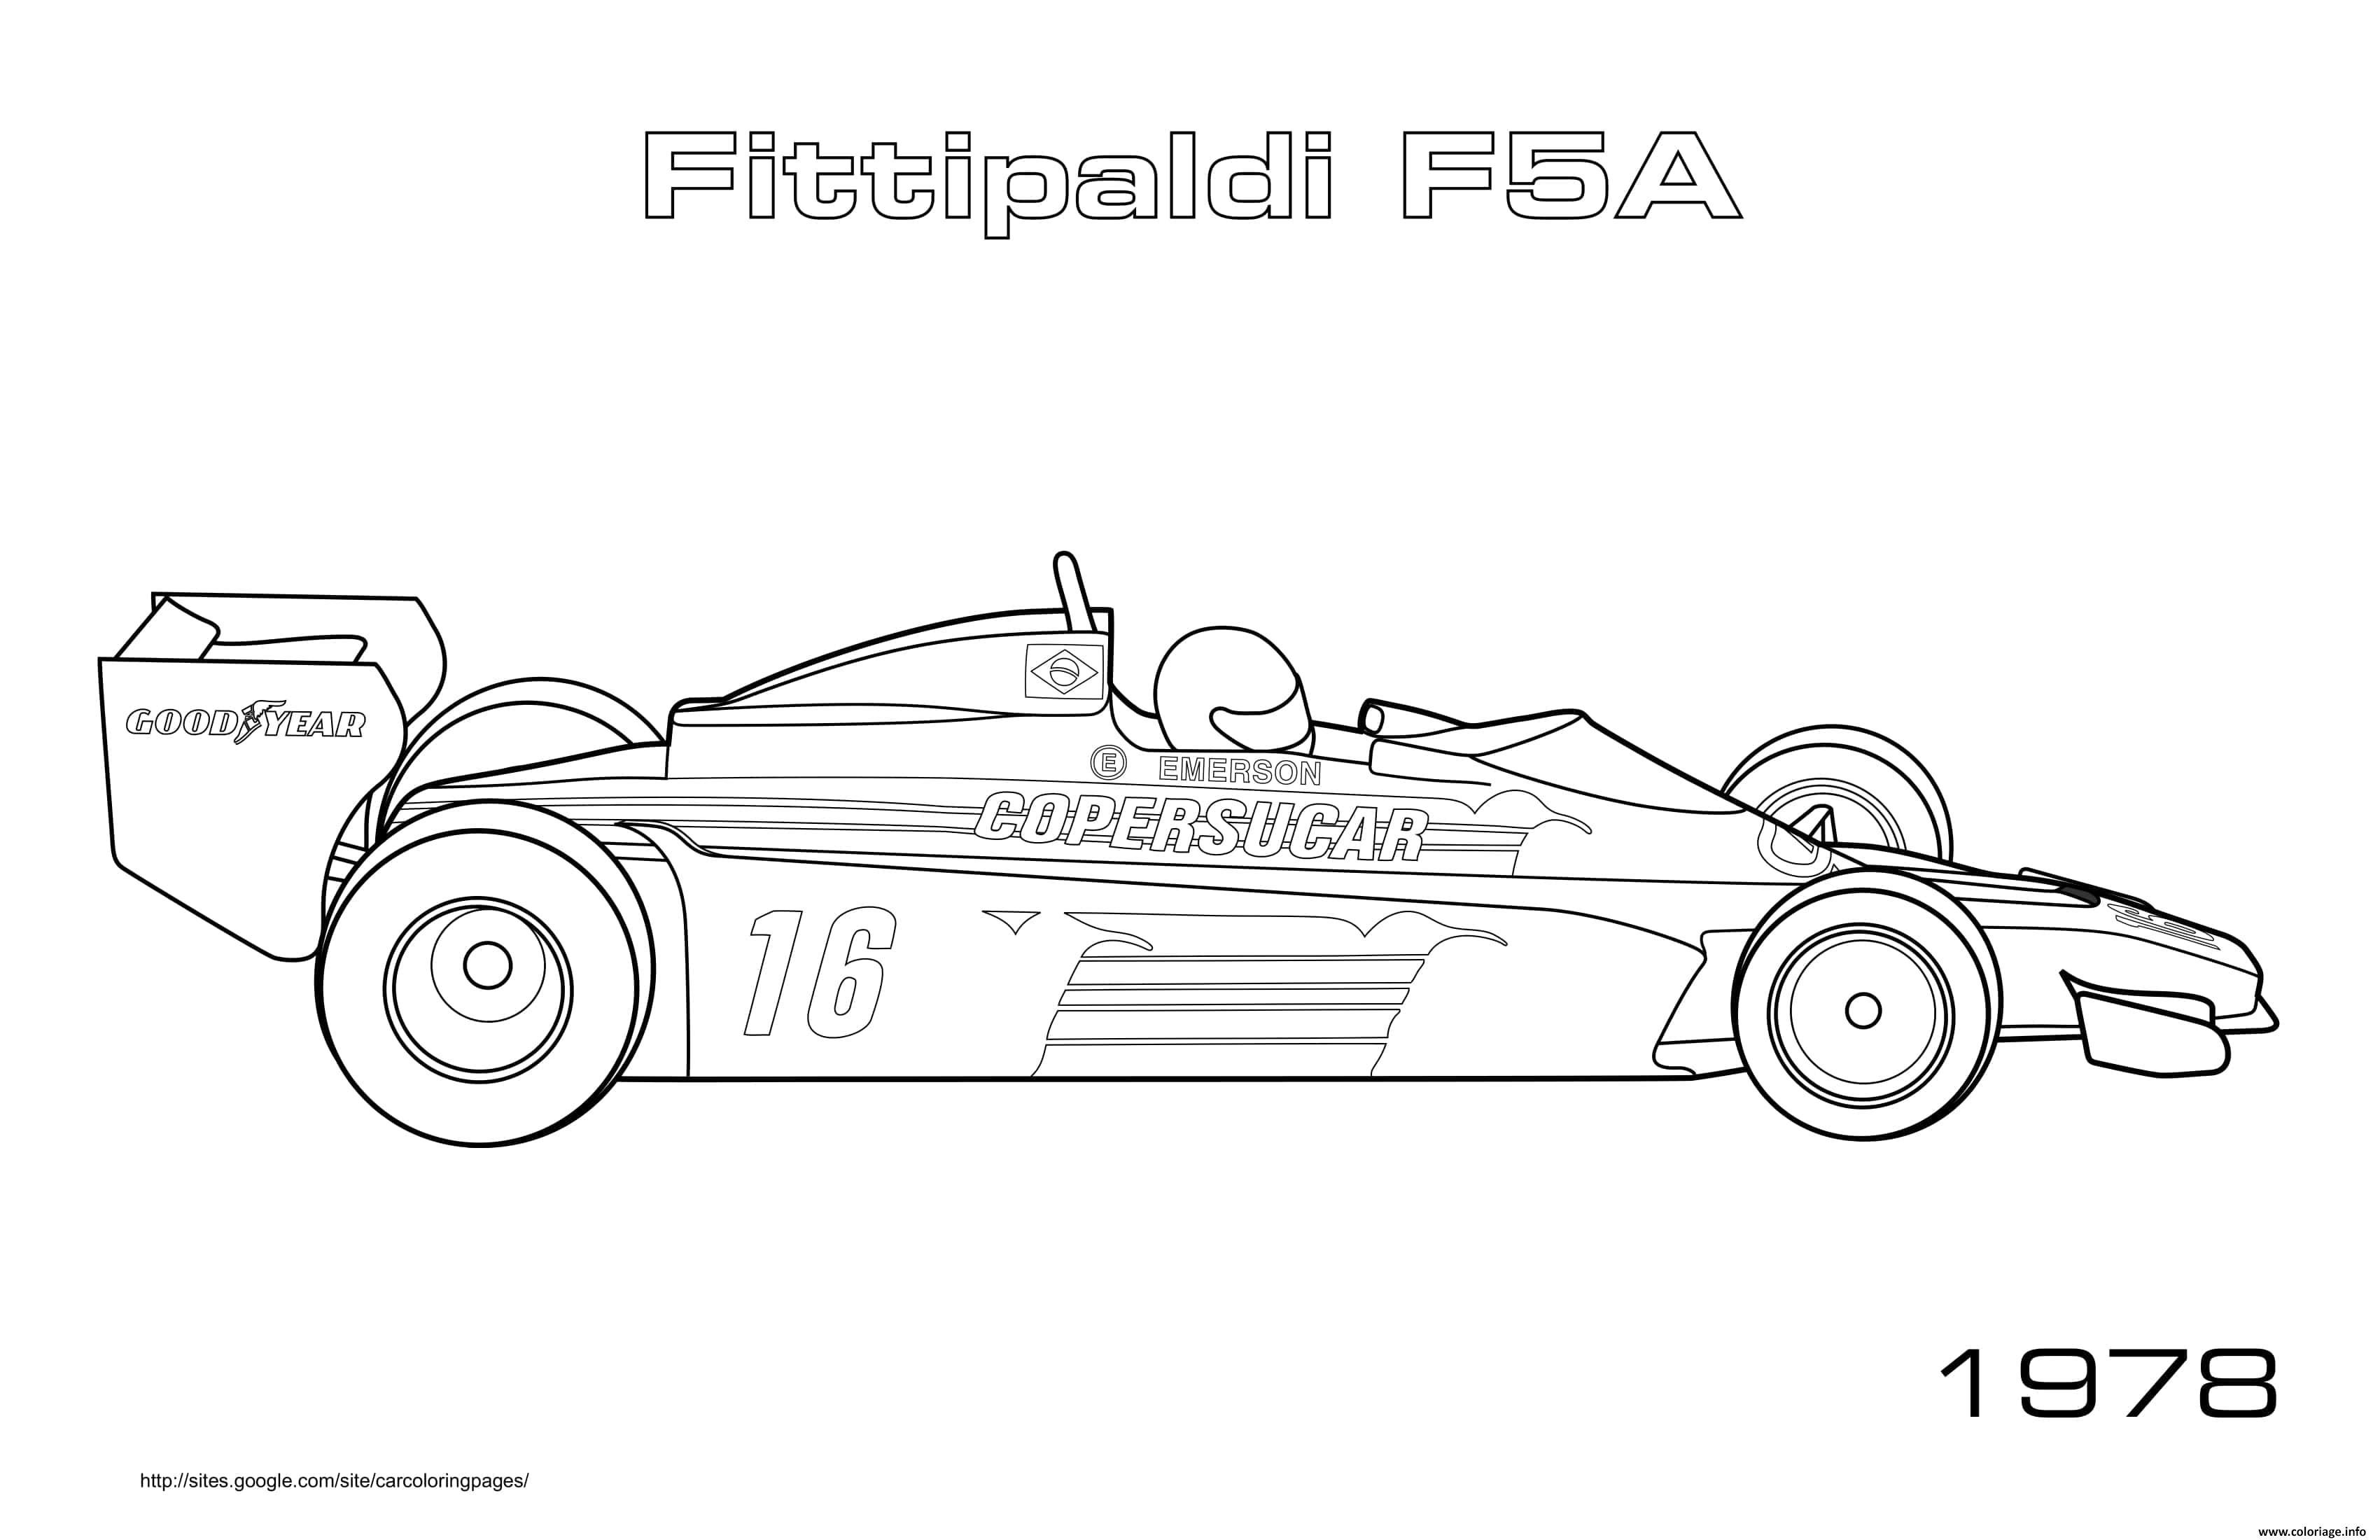 Dessin Sport F1 Fittipaldi F5a 1978 Coloriage Gratuit à Imprimer